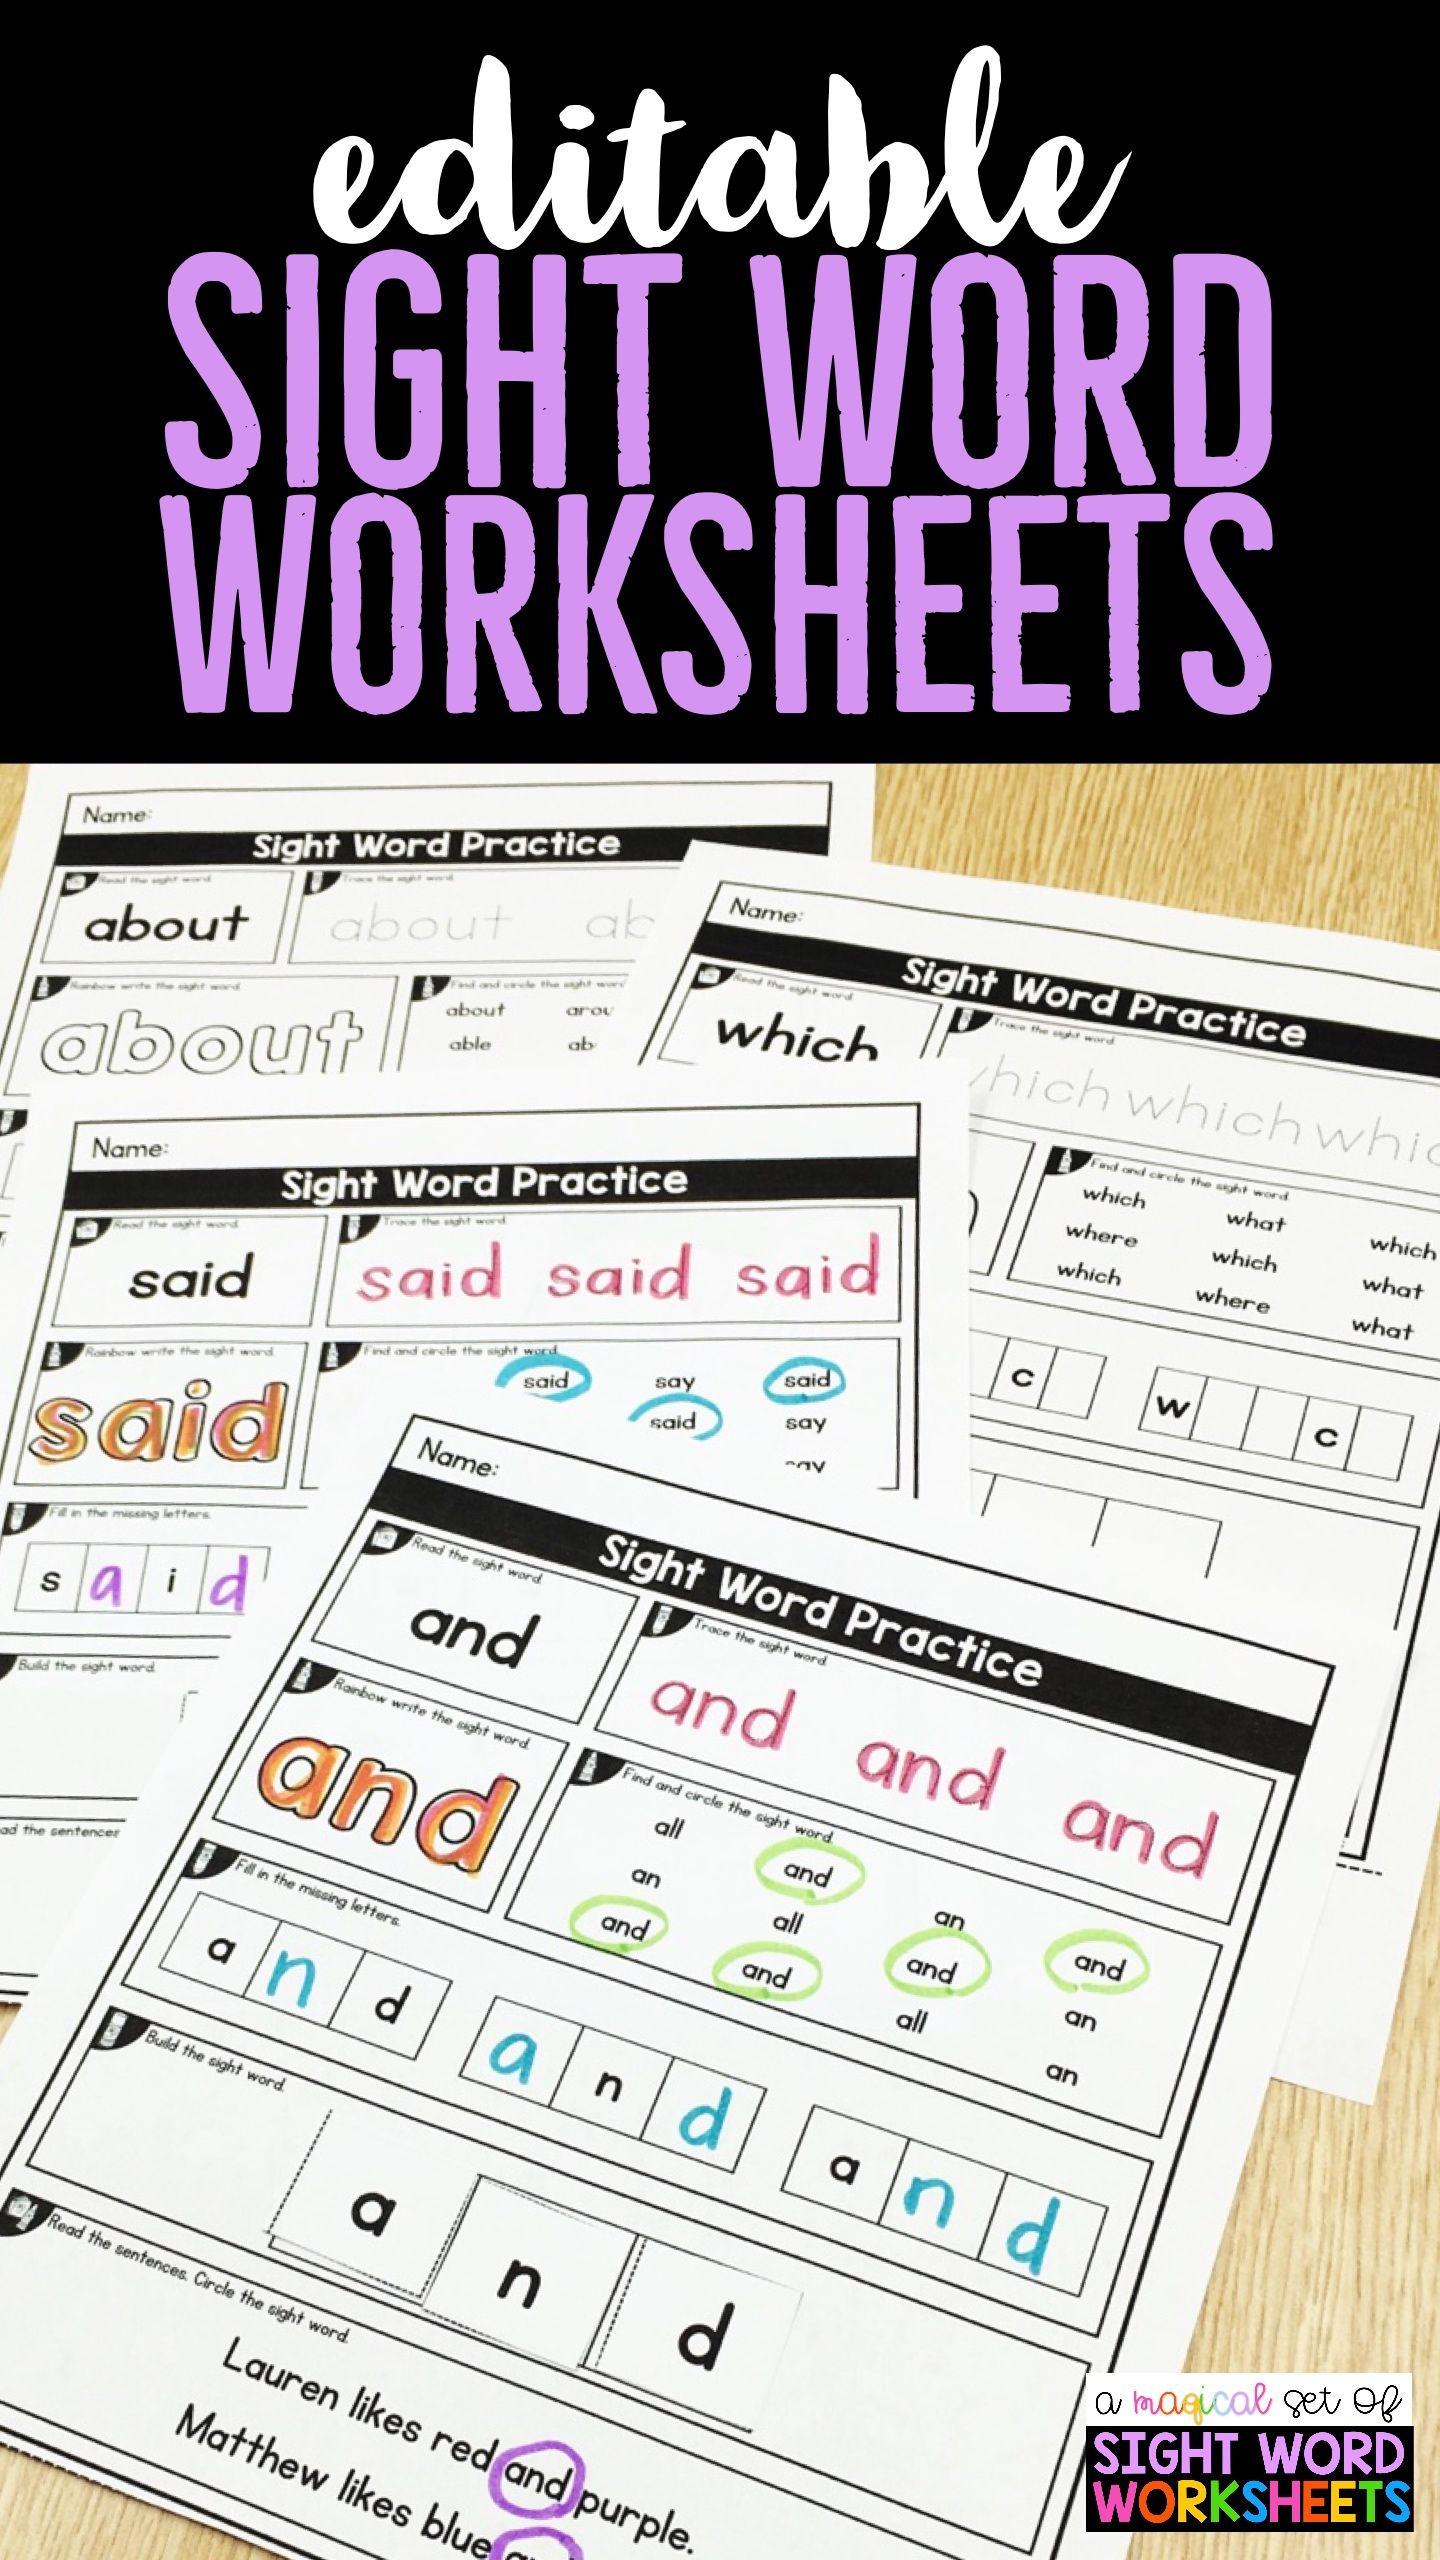 Sight word worksheets for kindergarten first grade worksheets and